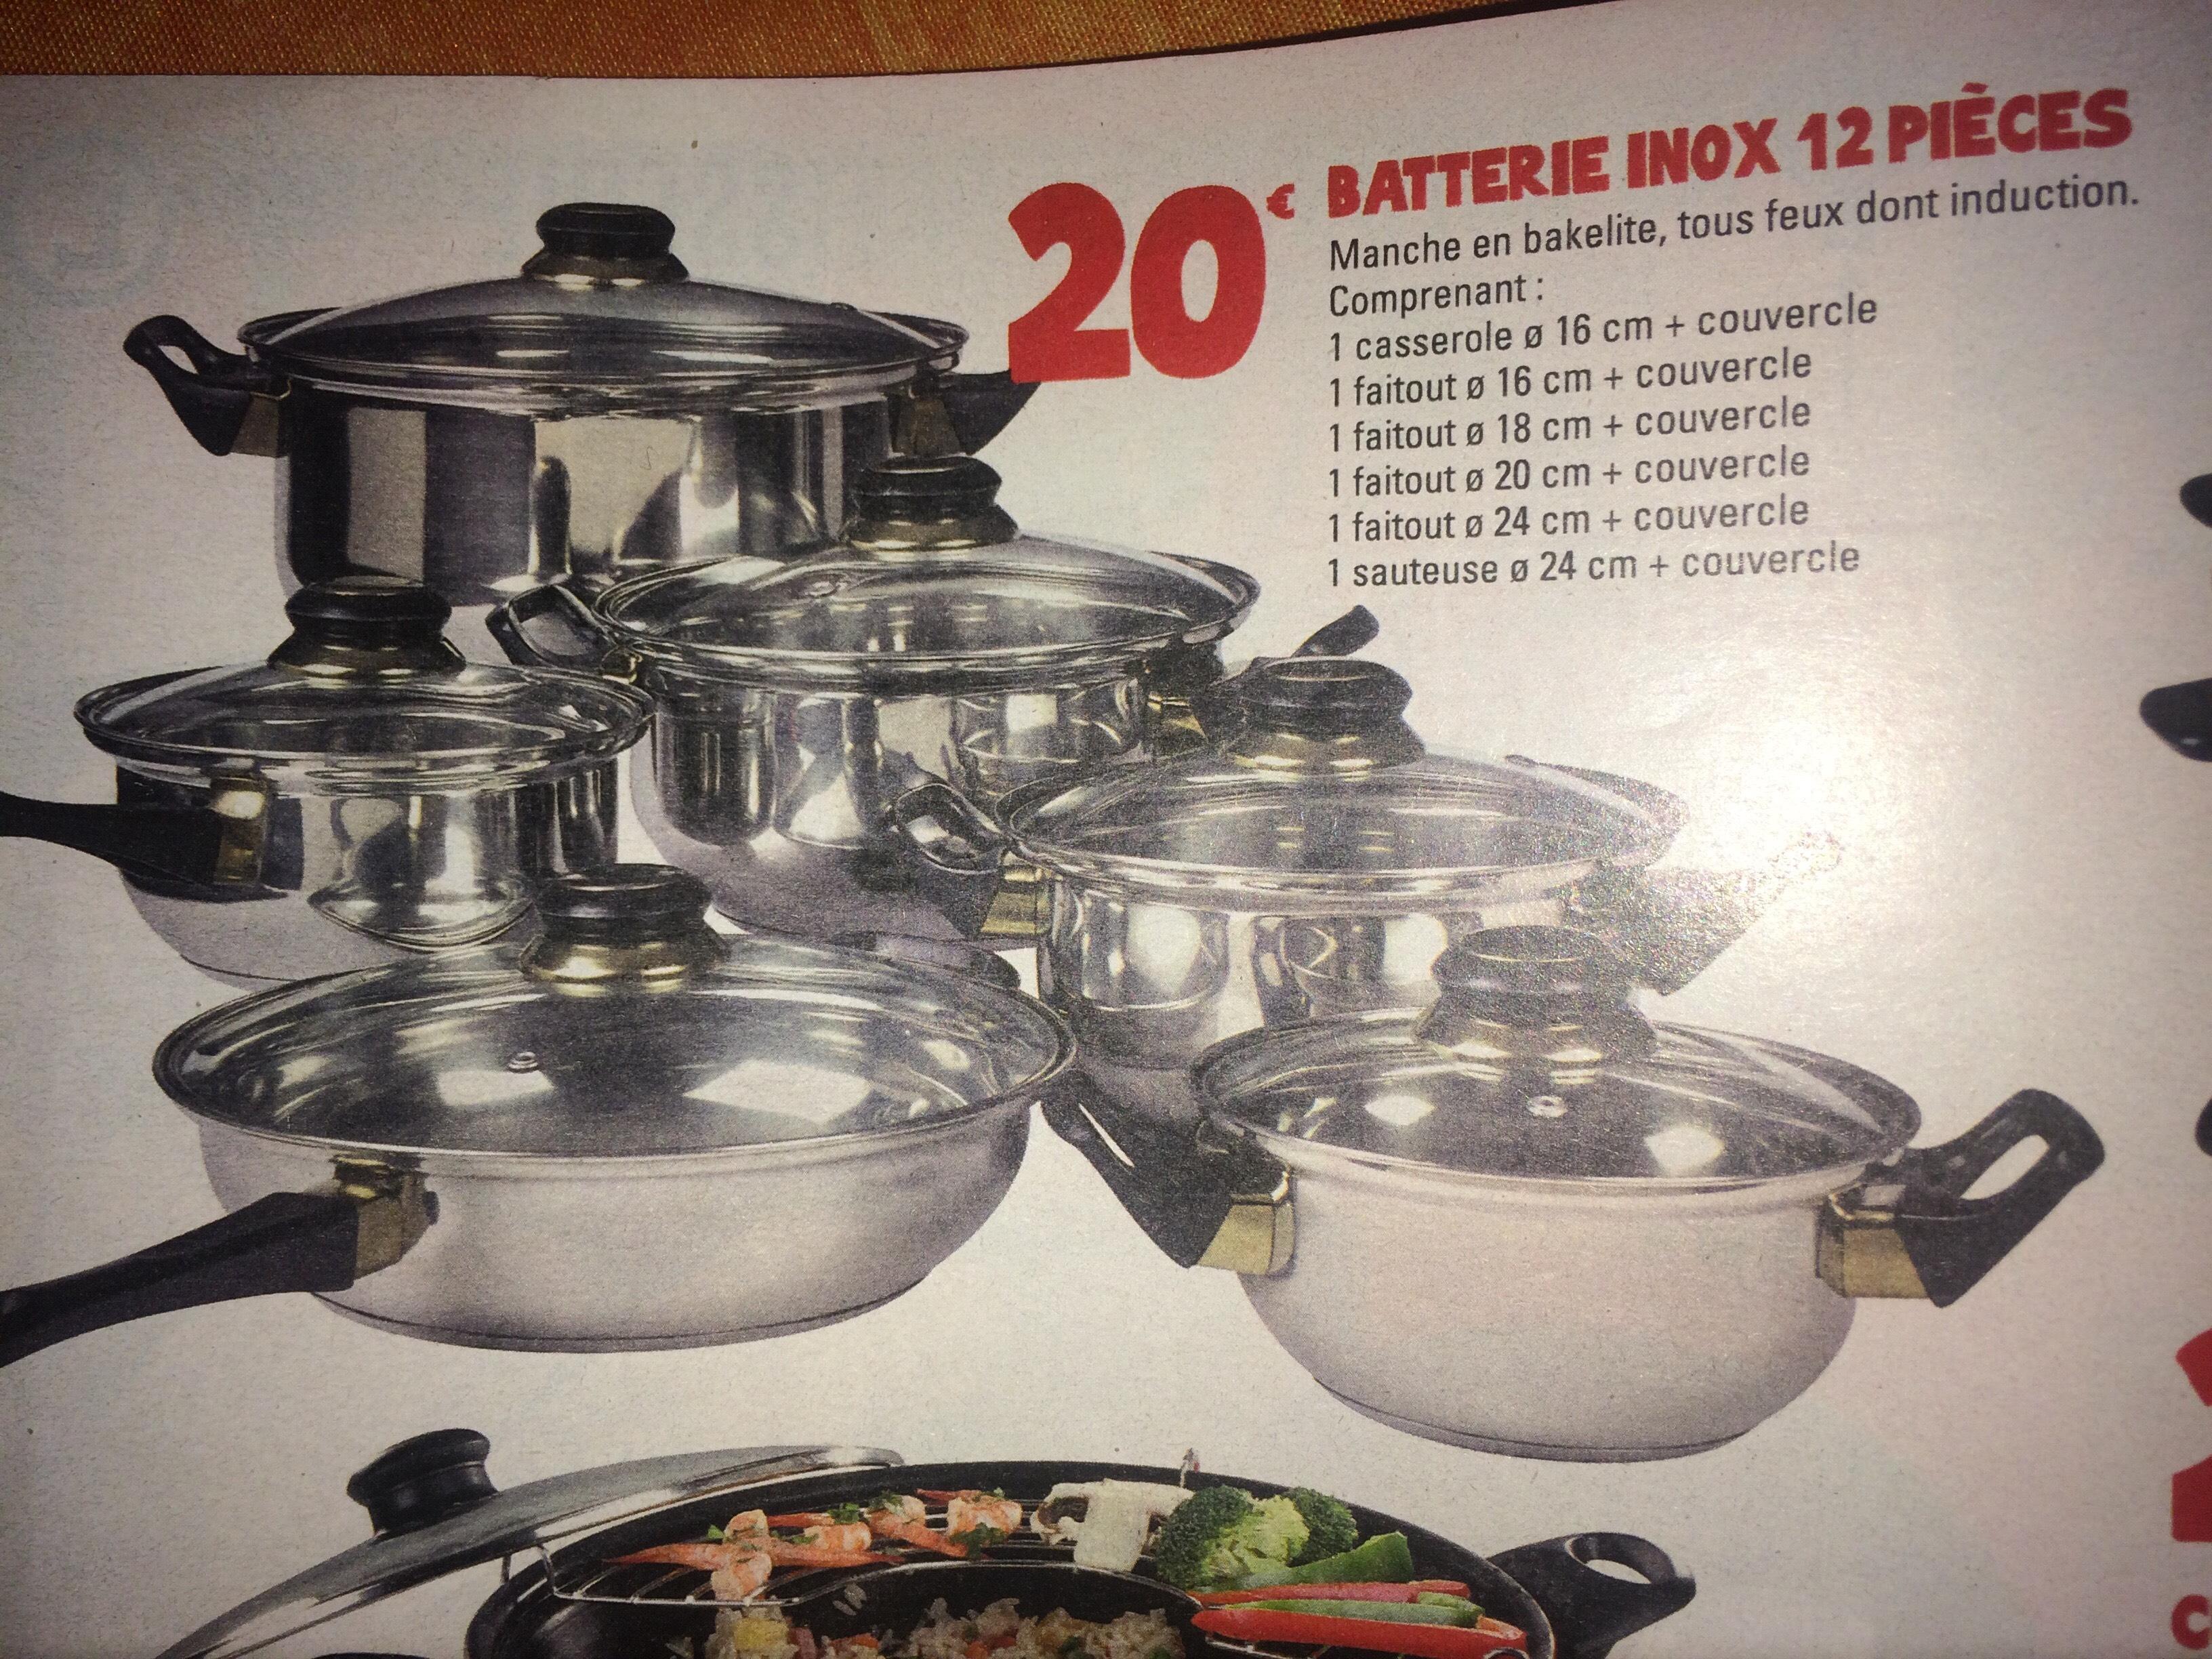 Batterie de cuisine en inox 12 pi ces for Espace cuisine casserole inox